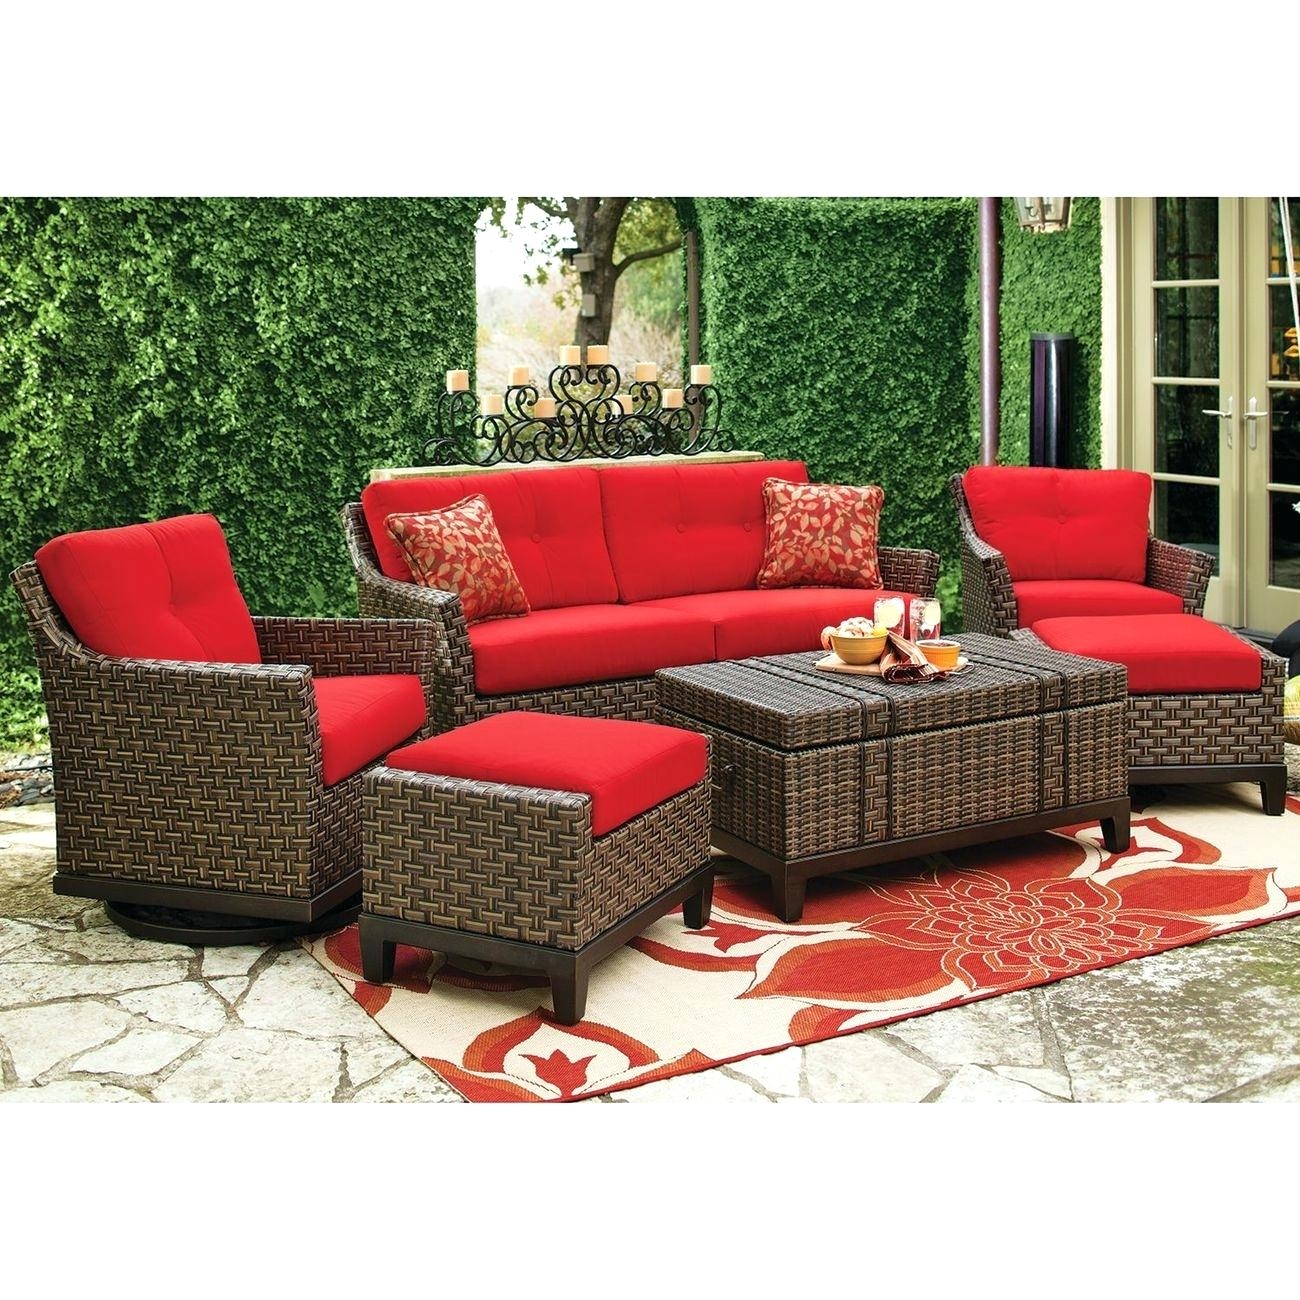 Wicker Deep Seating Patio Furniture 7